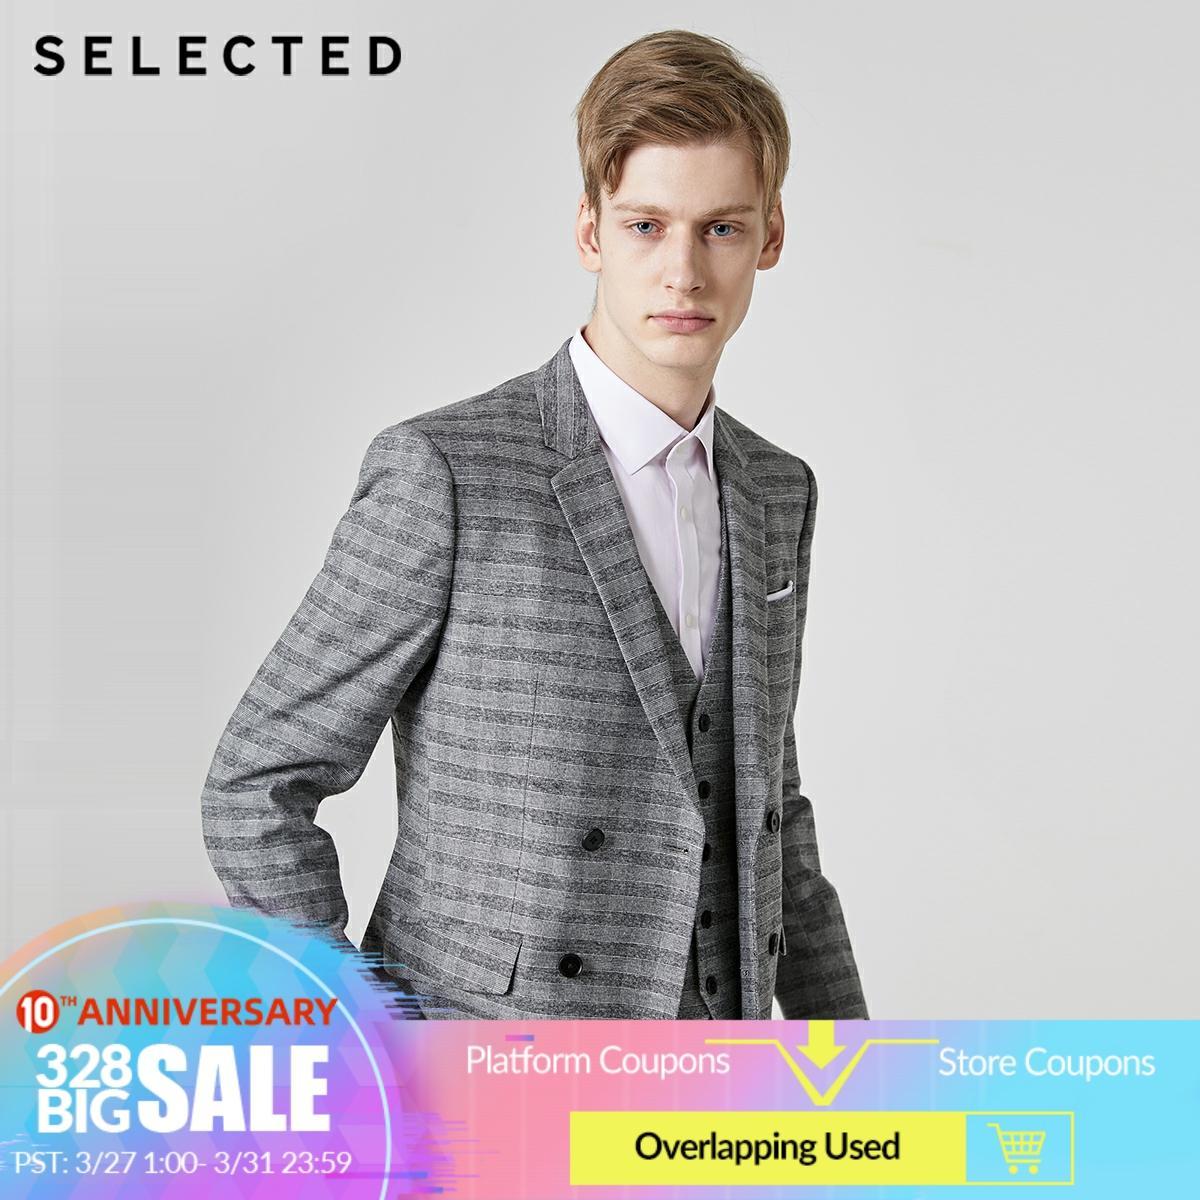 SELECTED Men's Regular Slim-Fit Stripe Blazer Closure Collar Jacket Clothes T | 41925X504